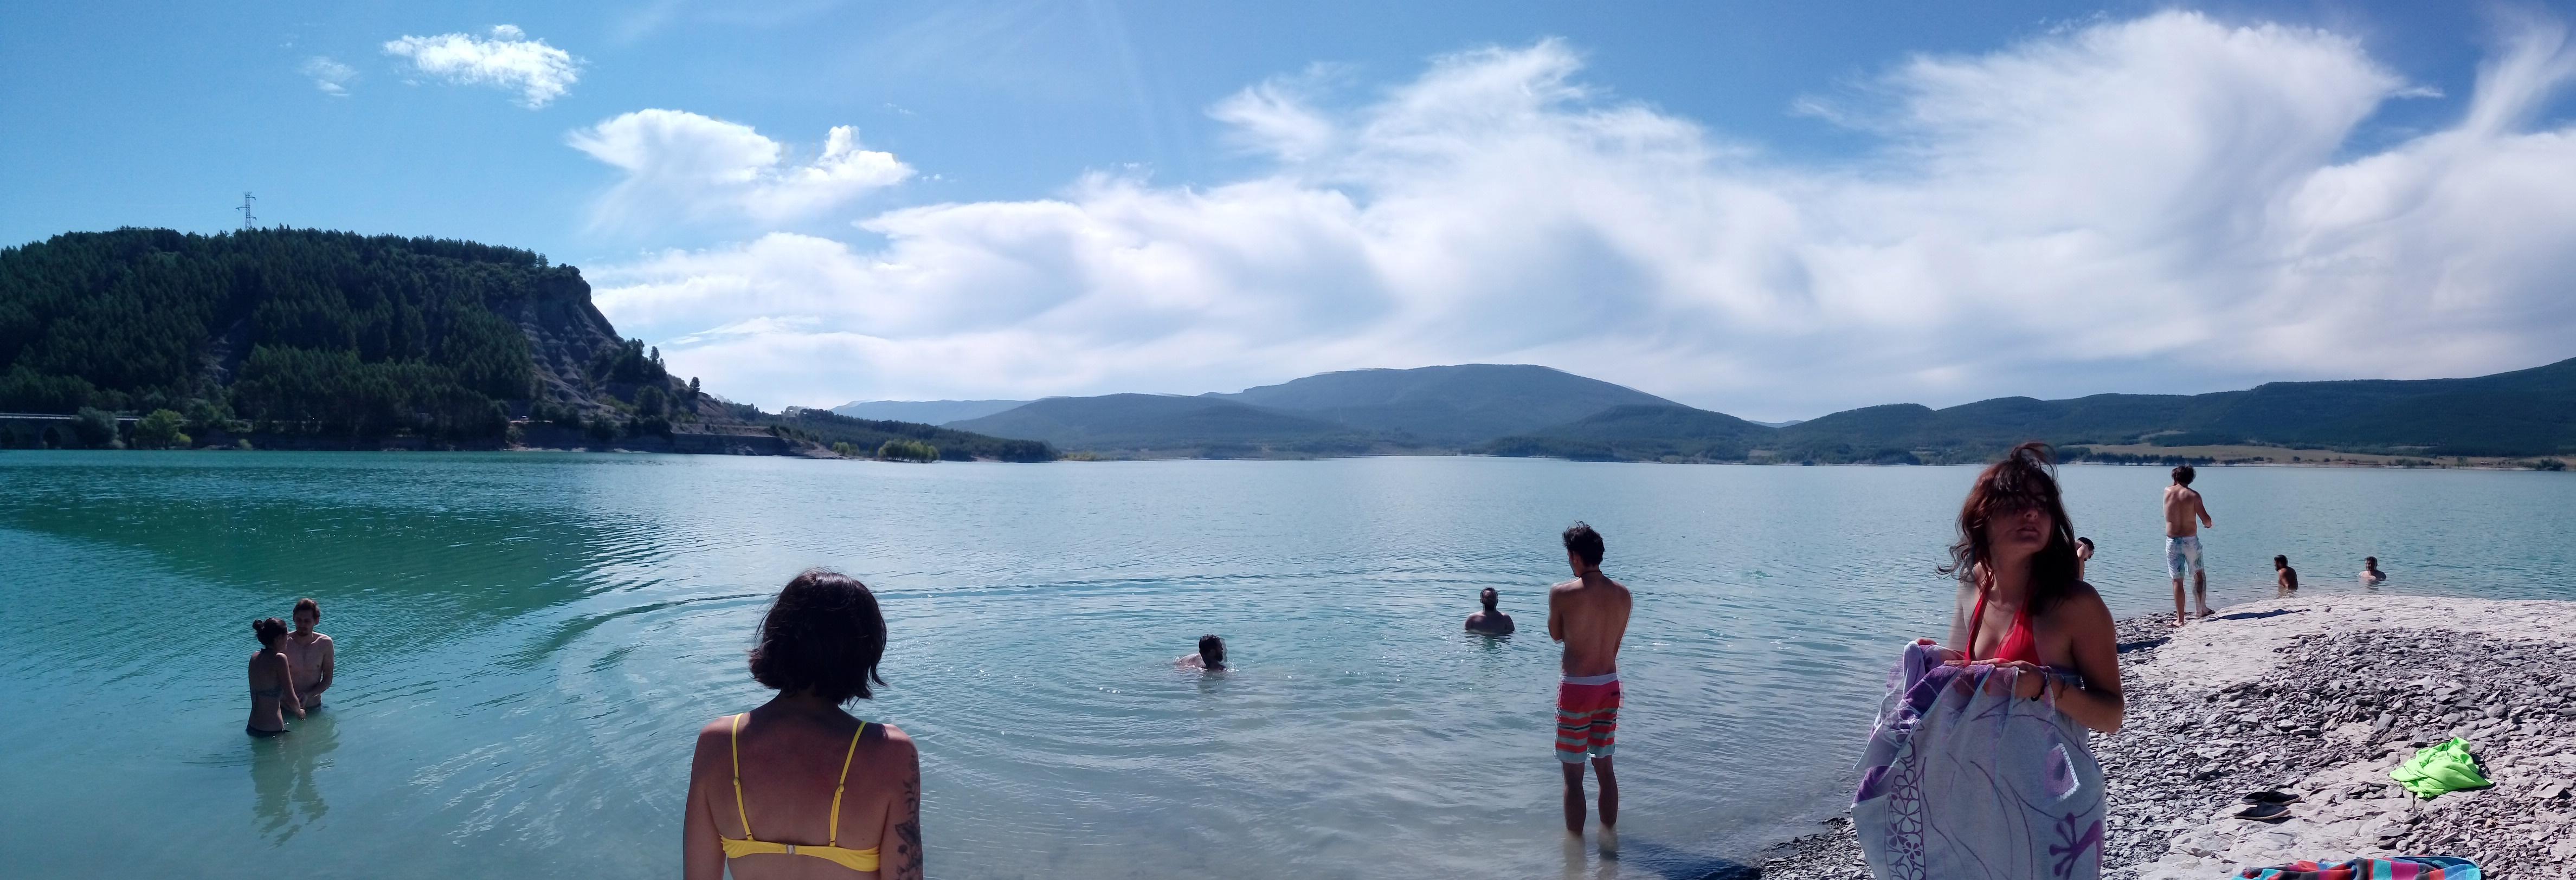 baignade-lac-de-yesa